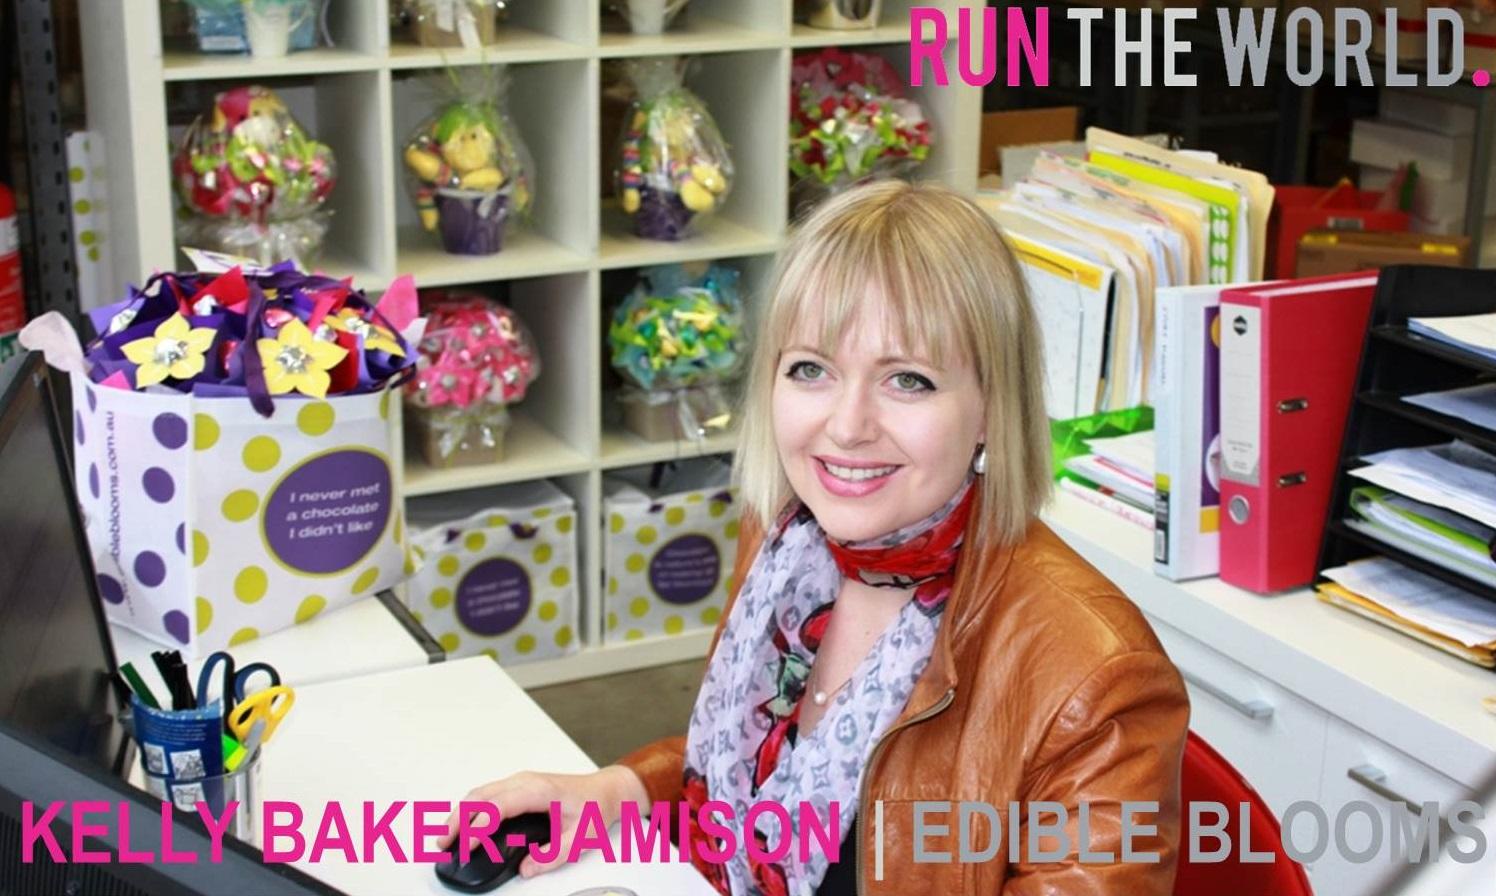 Kelly Baker-JAMISON - EDIBLE BLOOMS - WITH LOGO.jpg